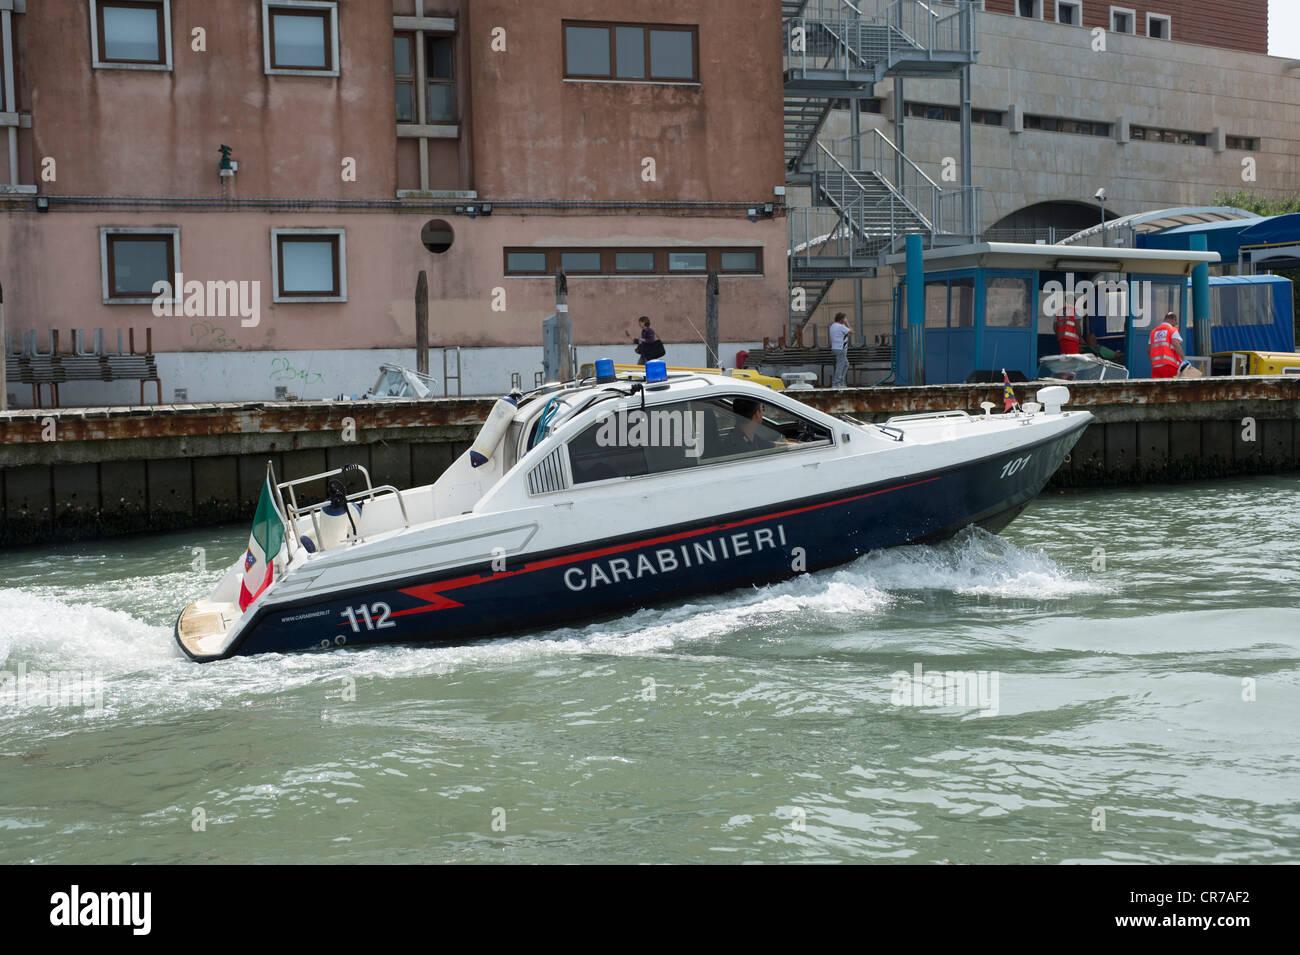 Venetian Carabinieri Police boat, Venice, Italy. Stock Photo